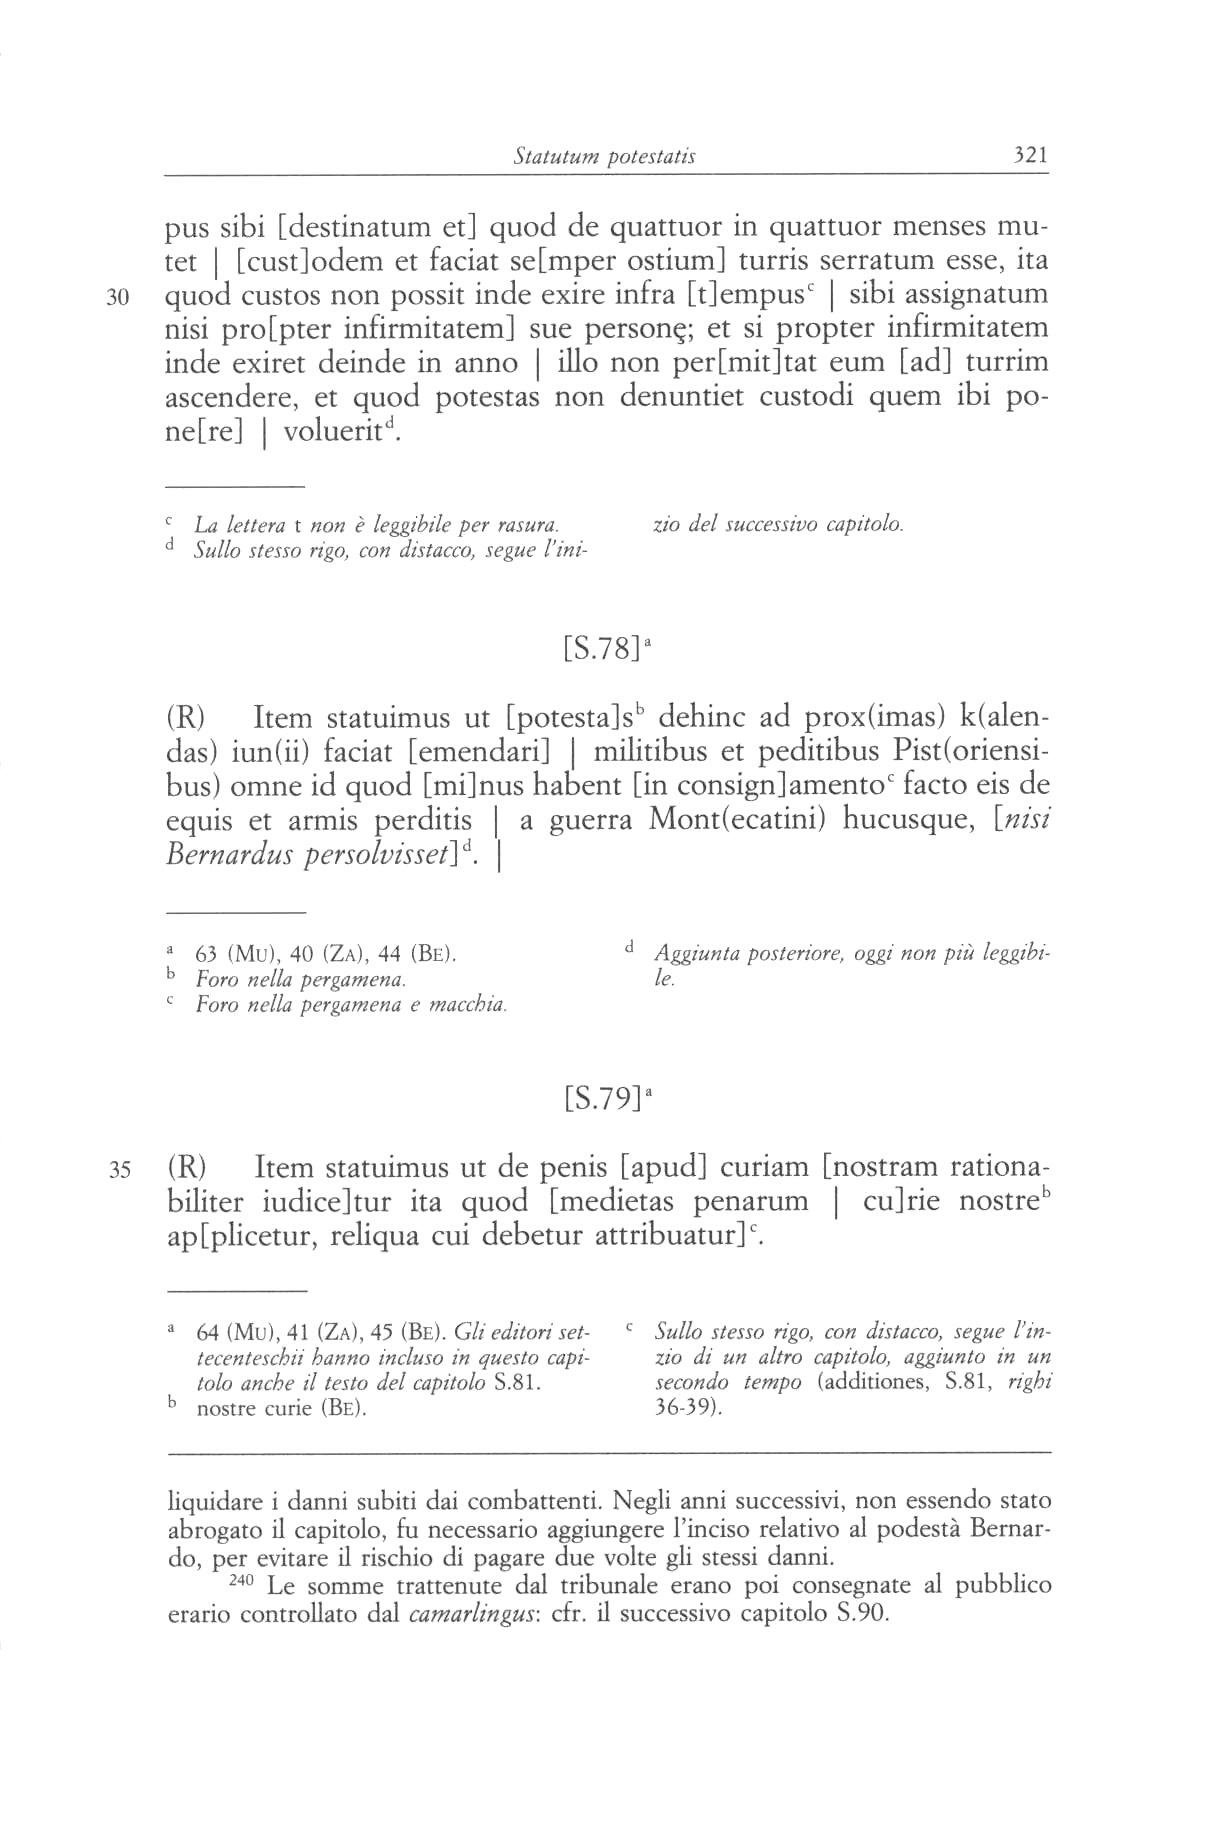 statuti pistoiesi del sec.XII 0321.jpg